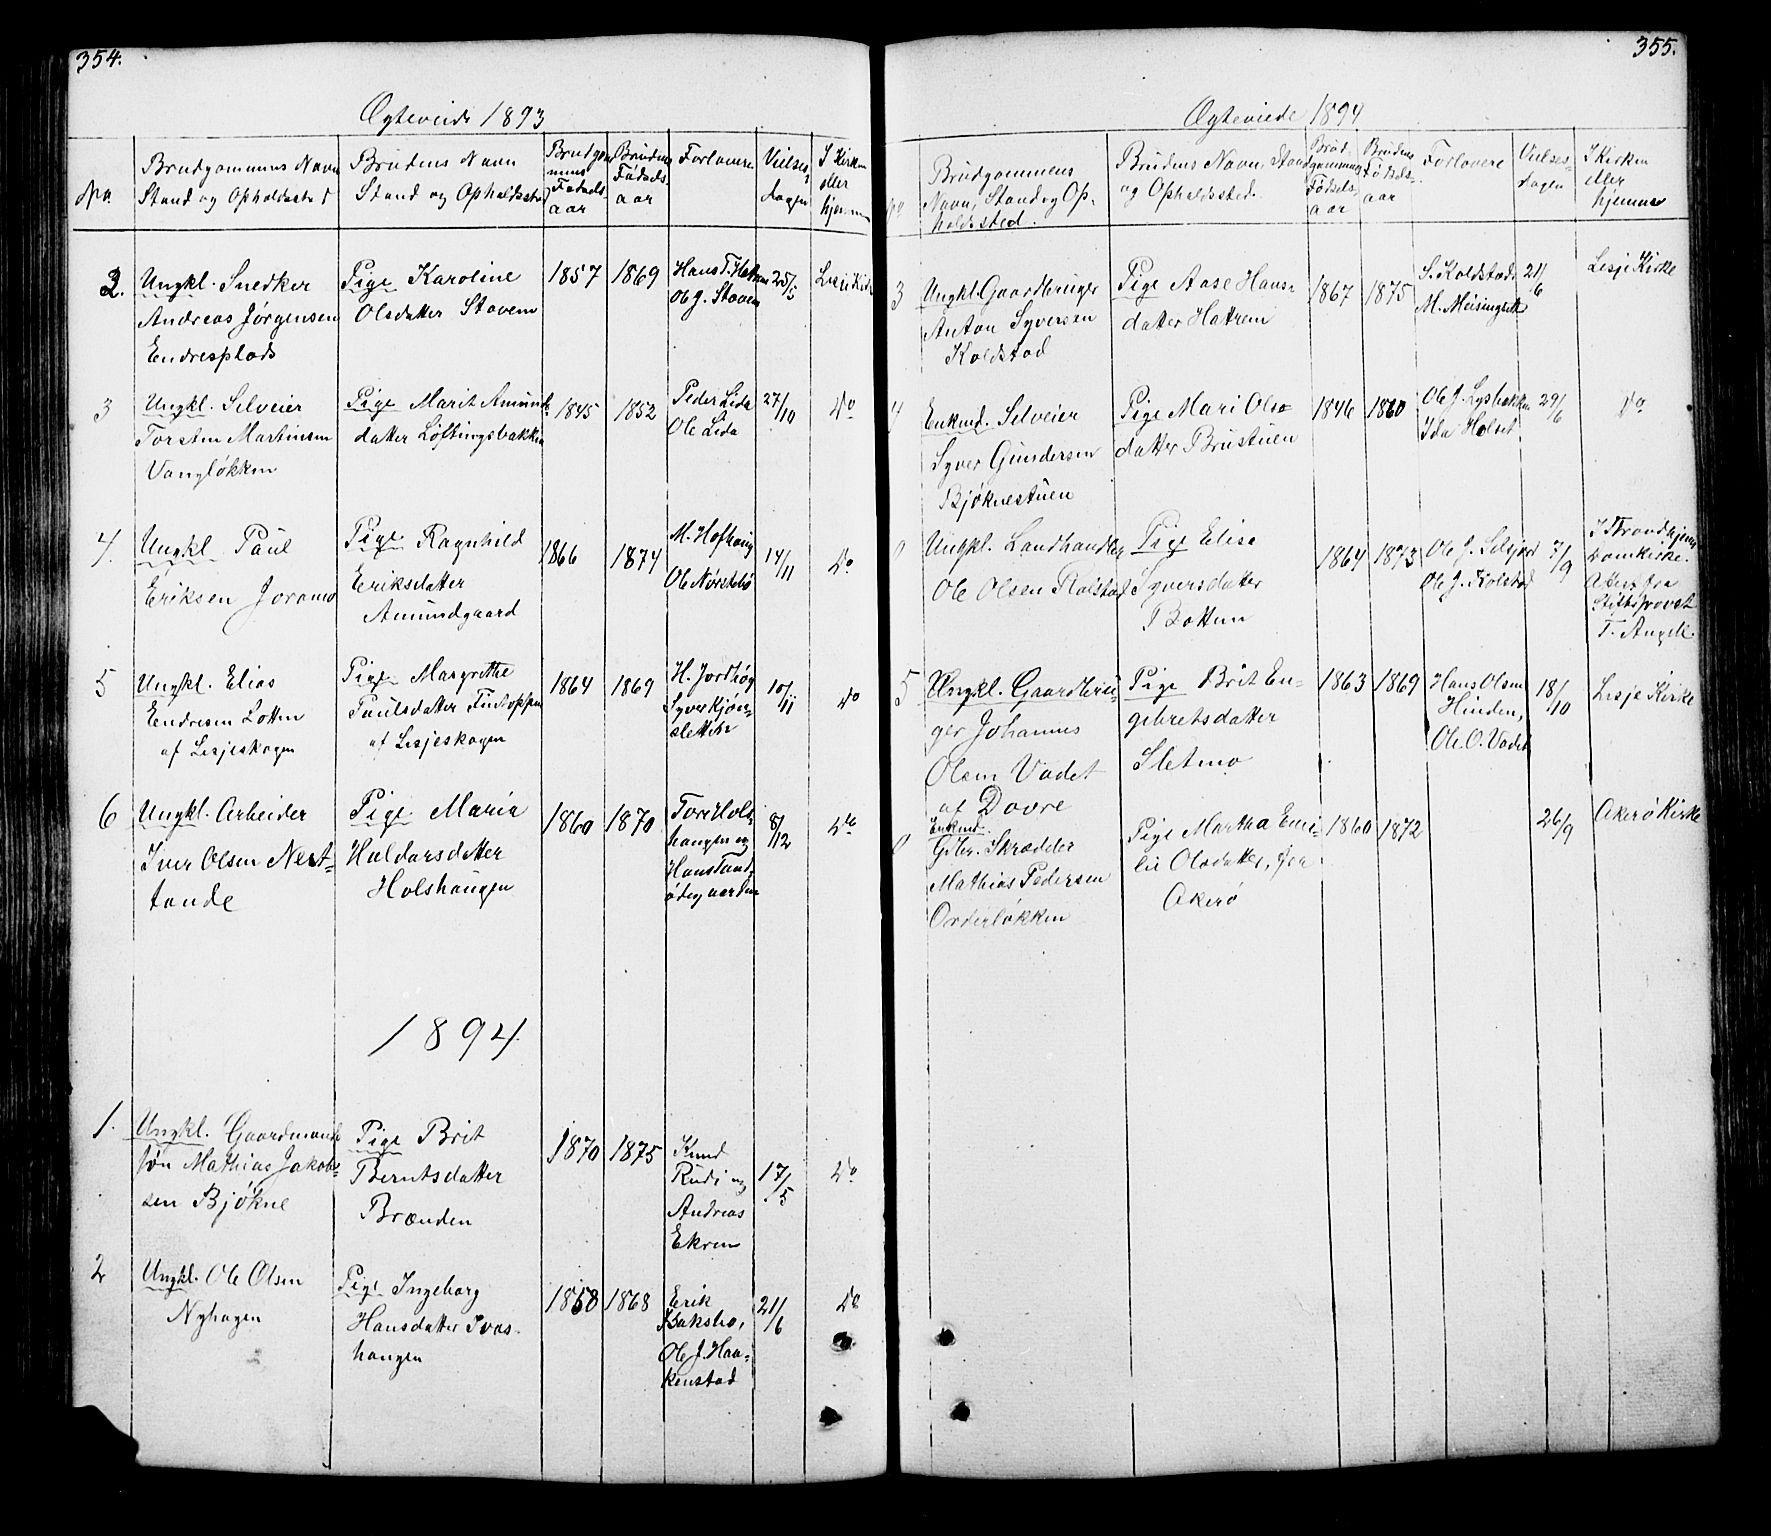 SAH, Lesja prestekontor, Klokkerbok nr. 5, 1850-1894, s. 354-355